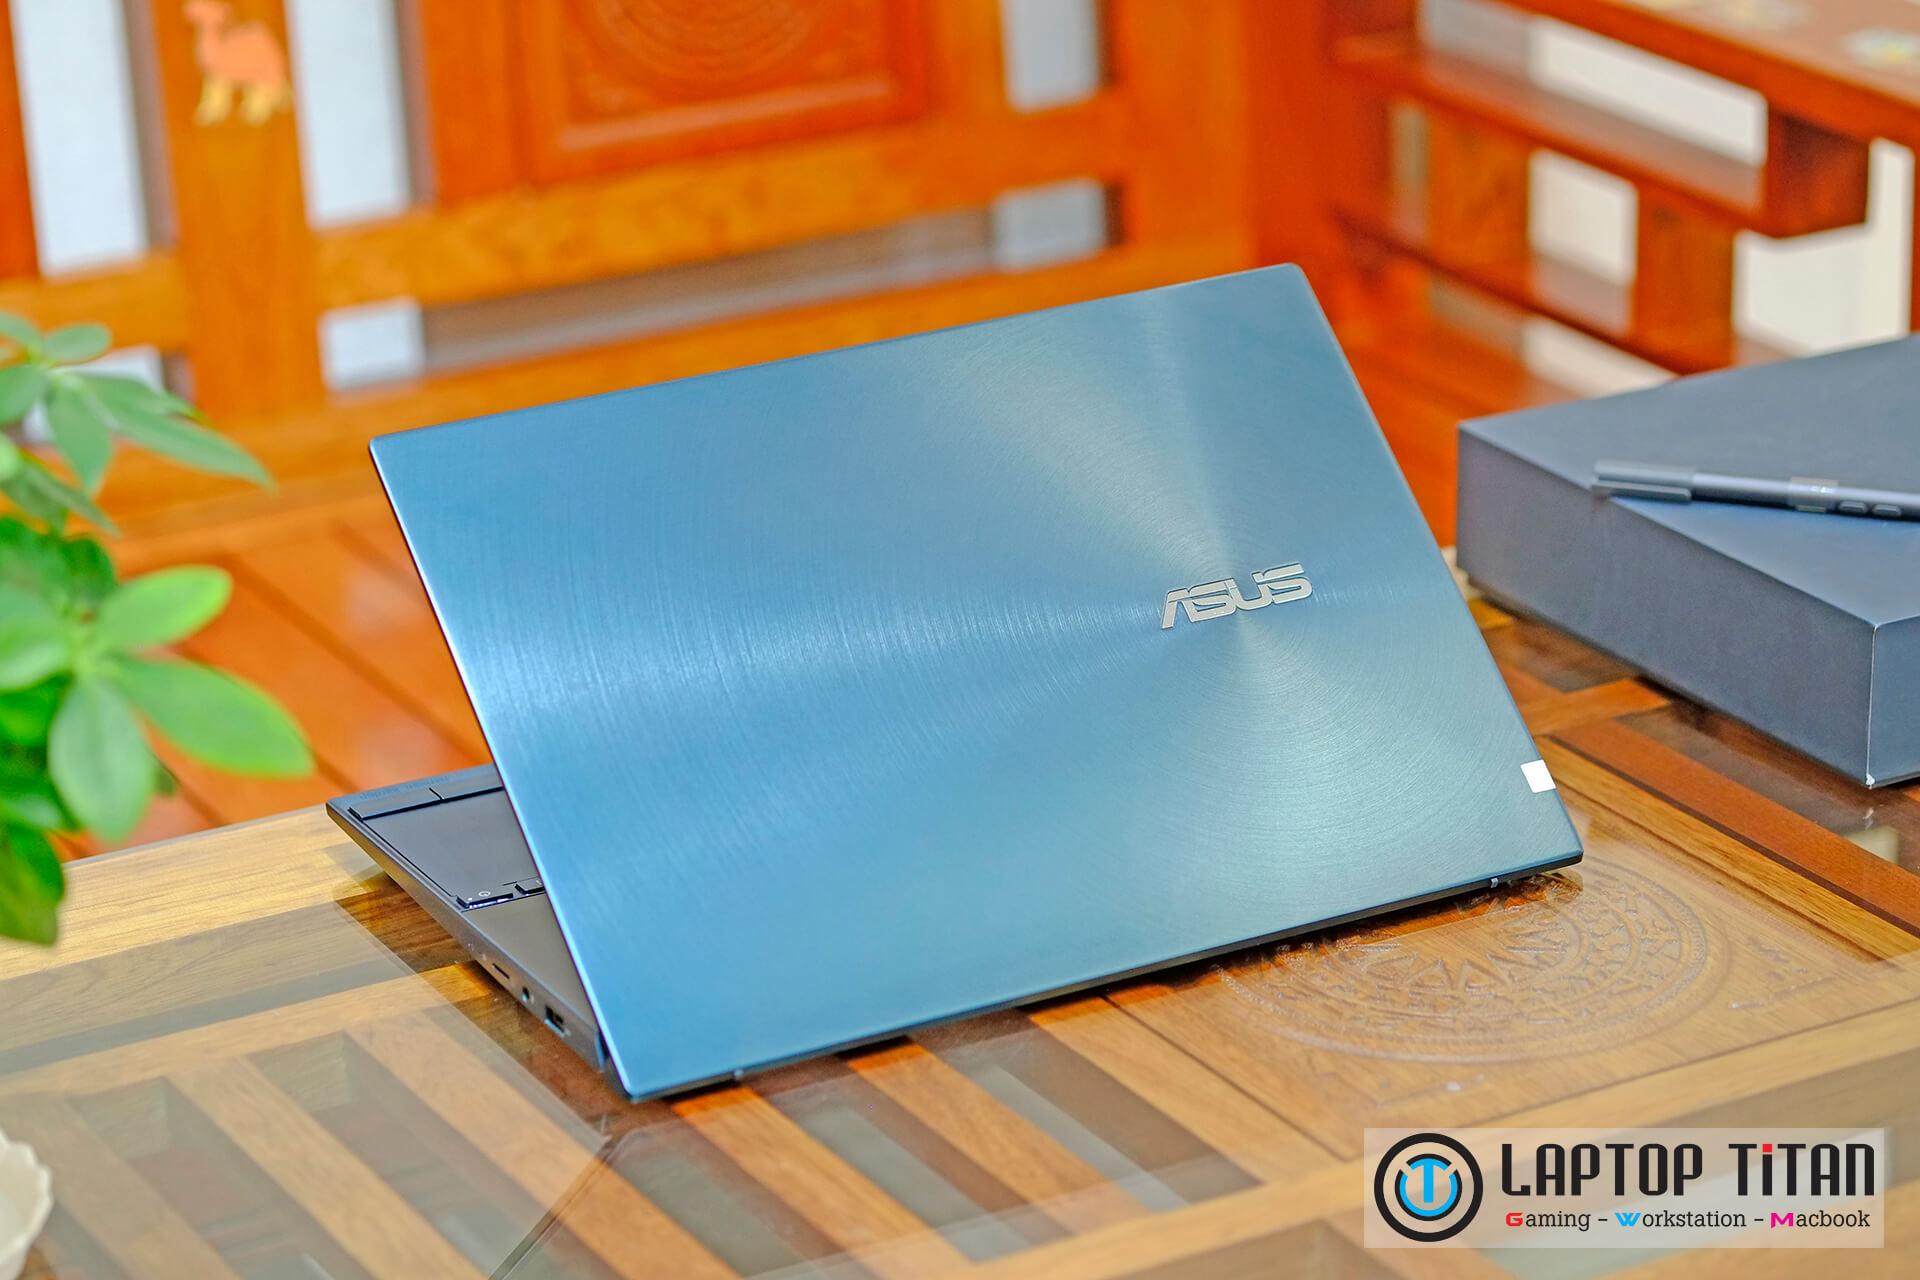 Asus Zenbook Duo Ux481Fl Laptoptitan 07